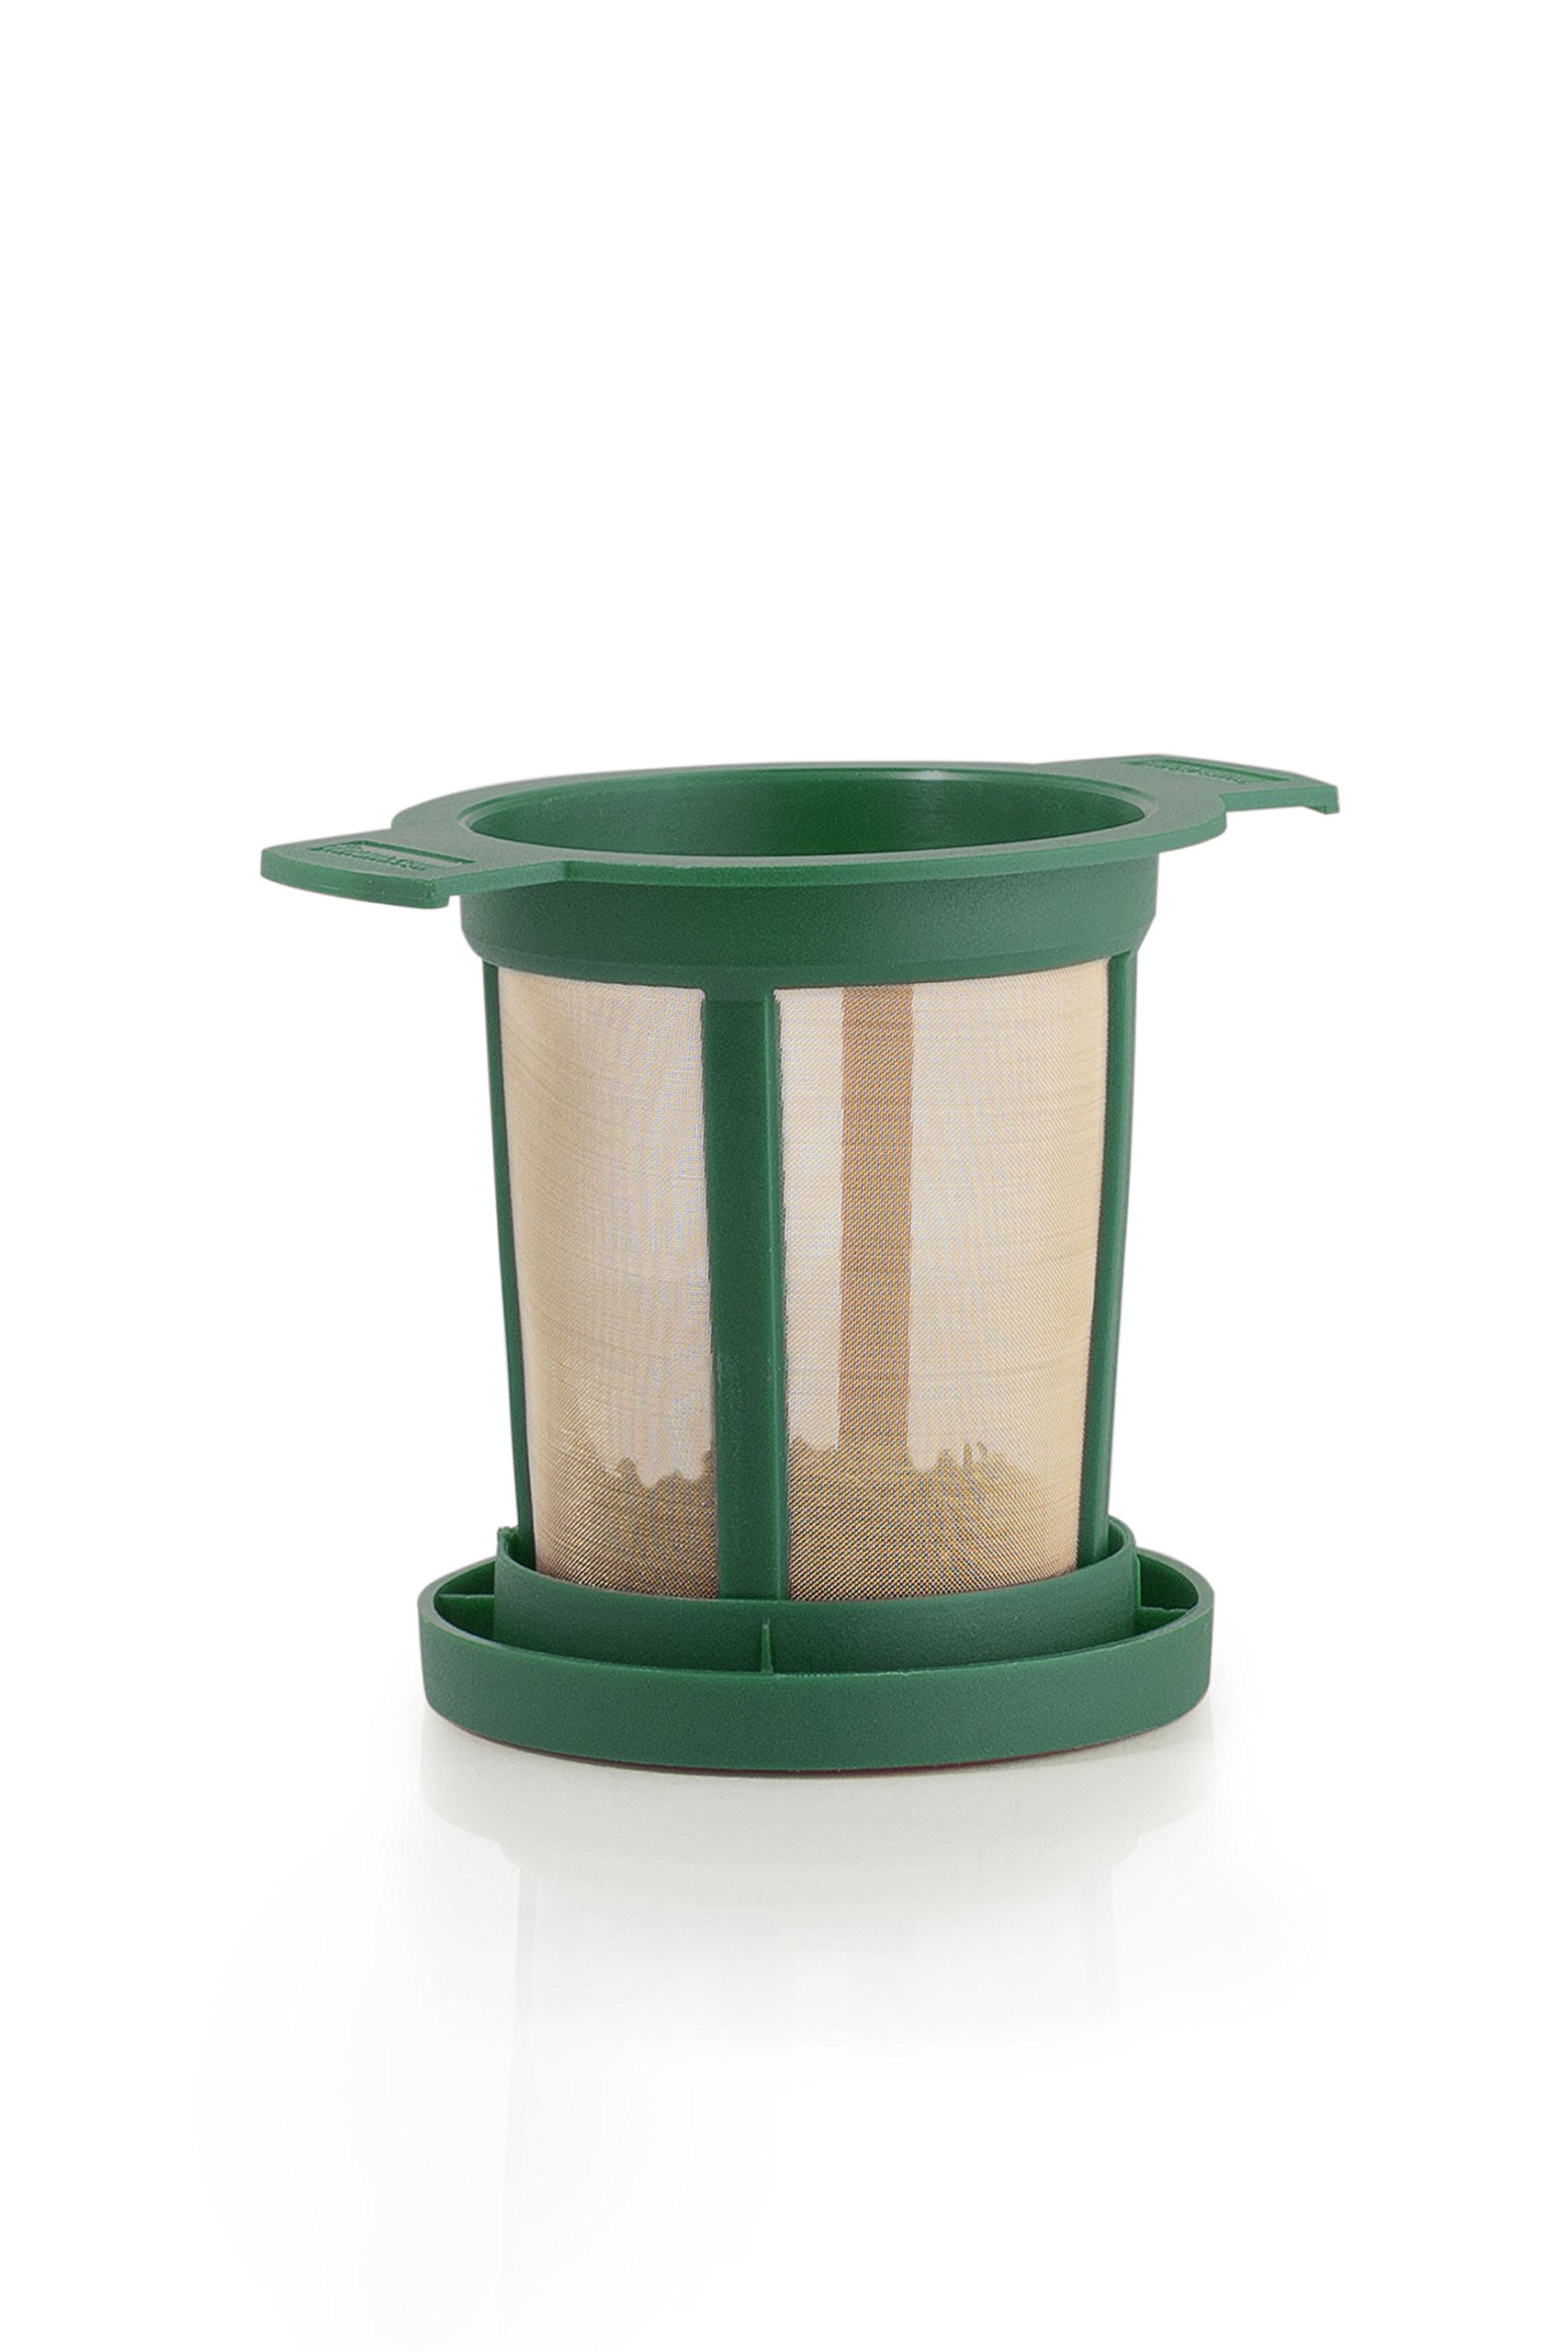 Brewing Basket M - Permanent Tea Filter, green (18 retail units per Case) by Finum